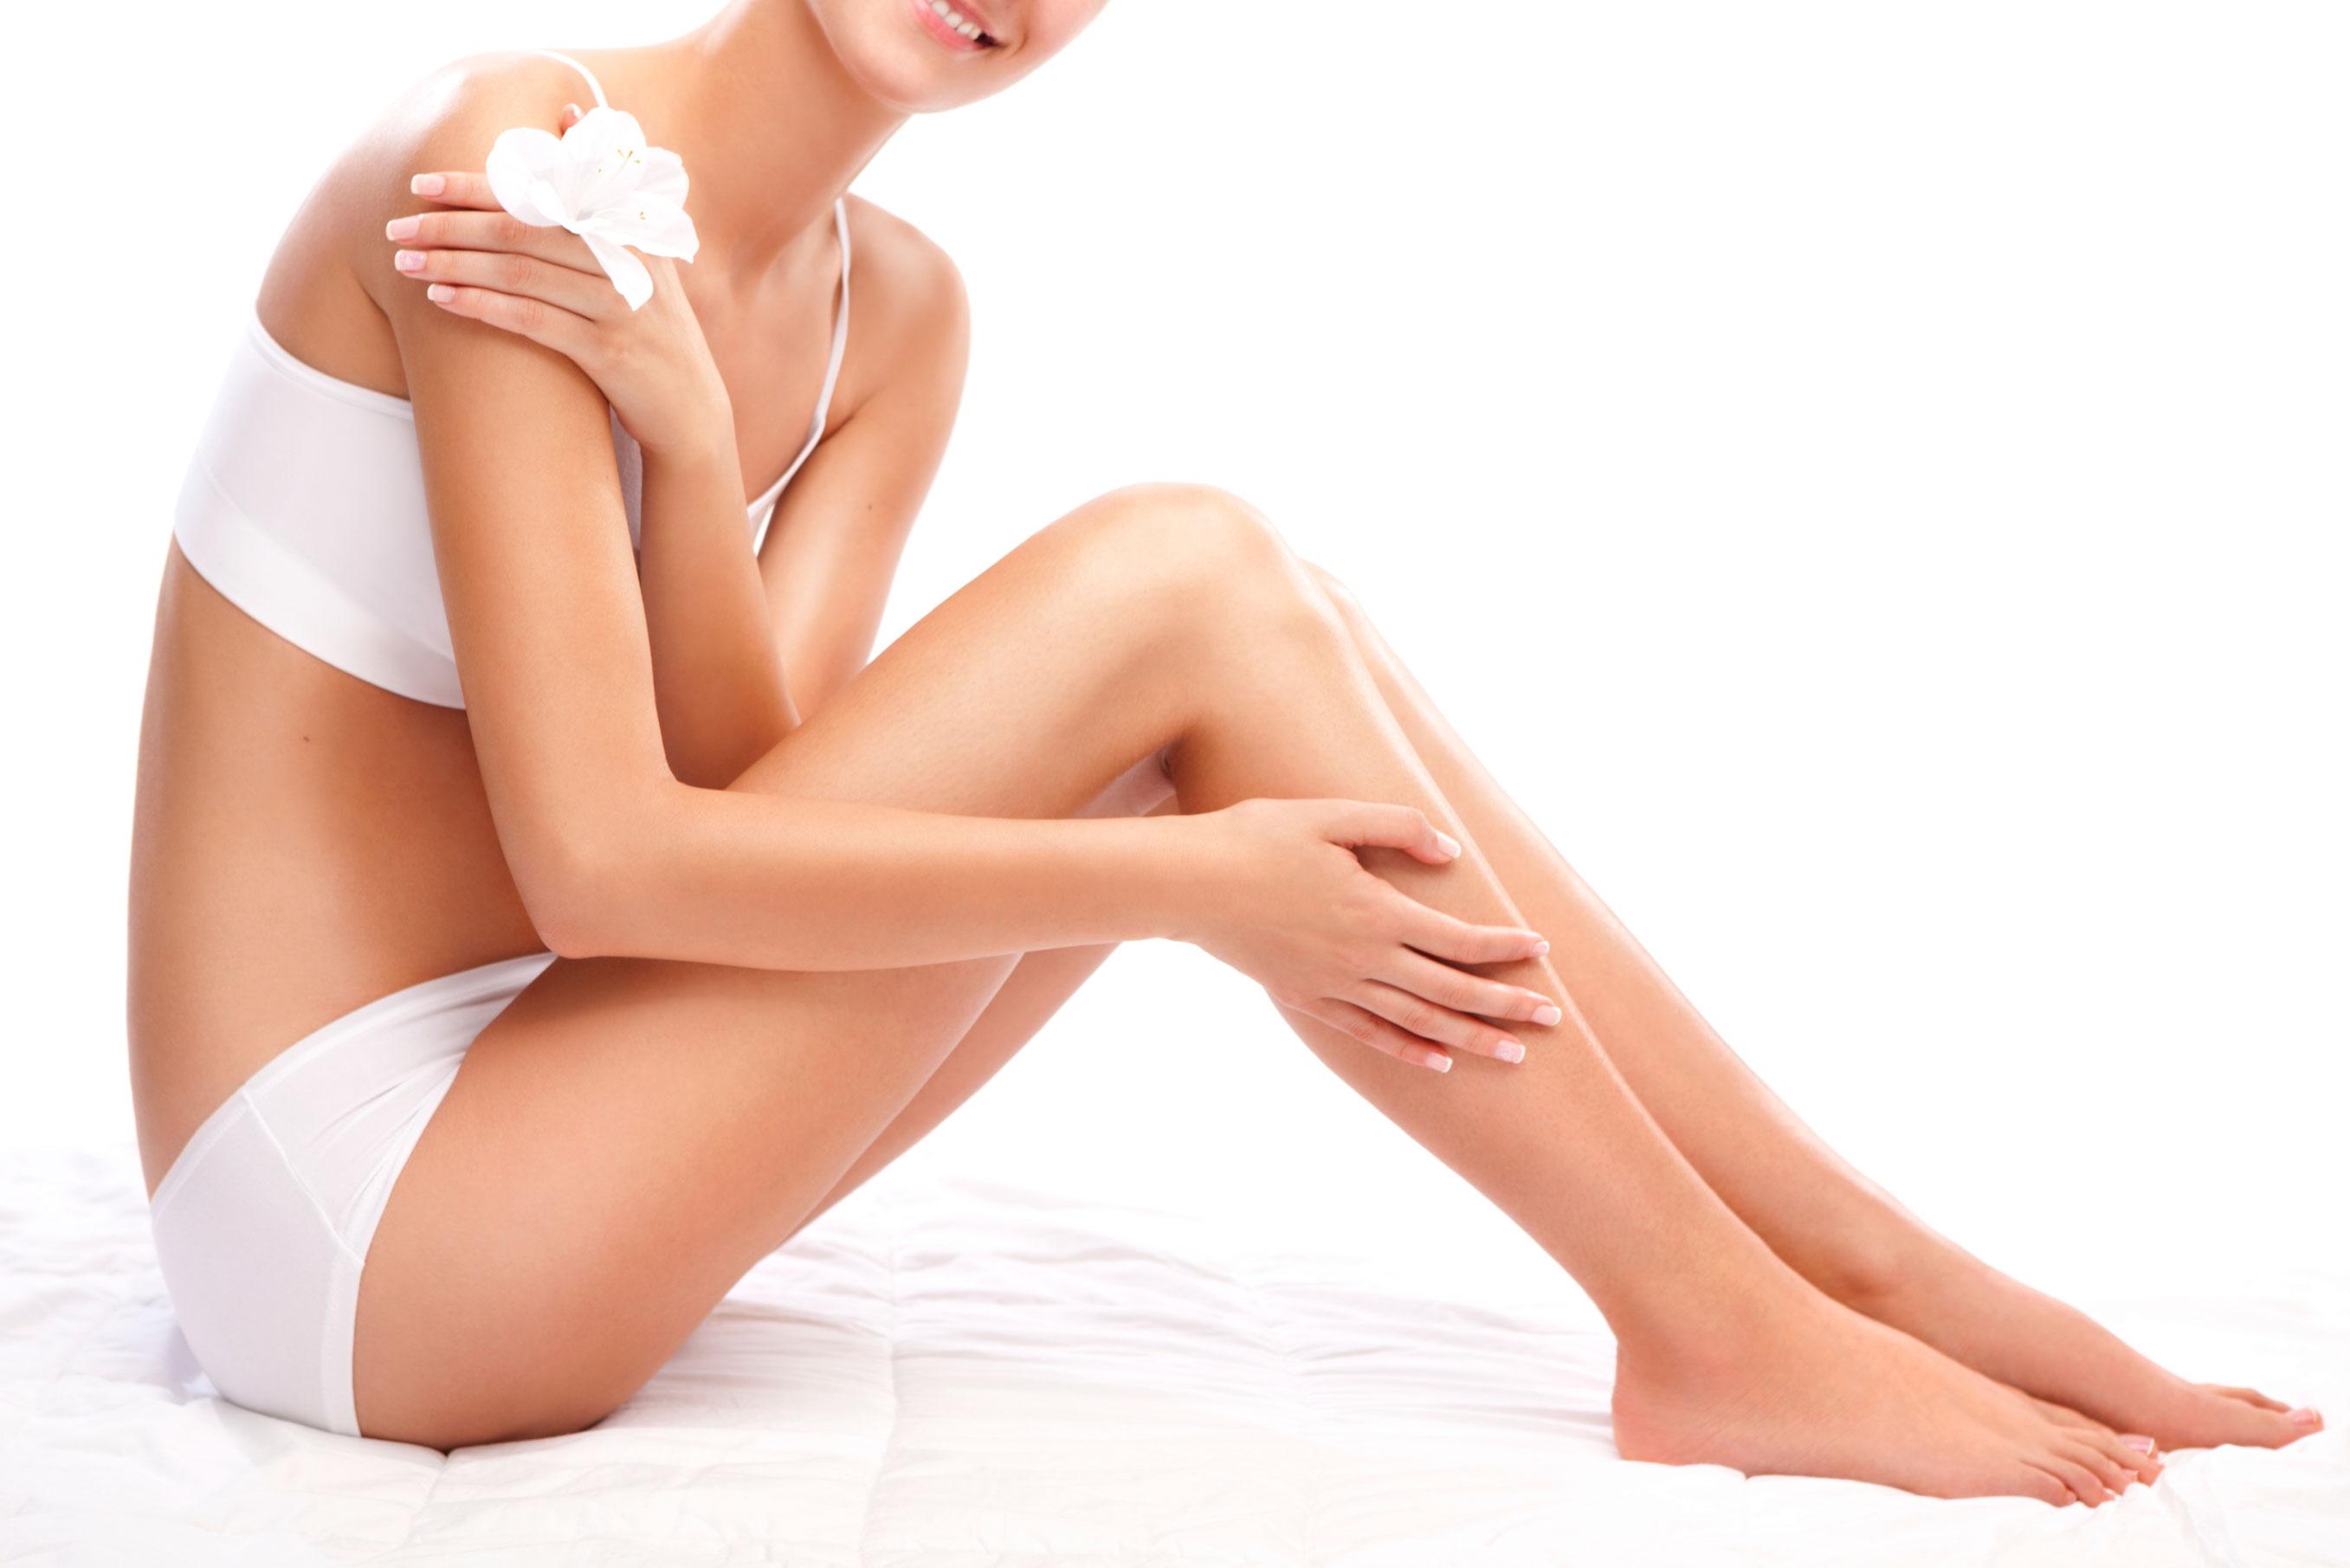 nourished body skin